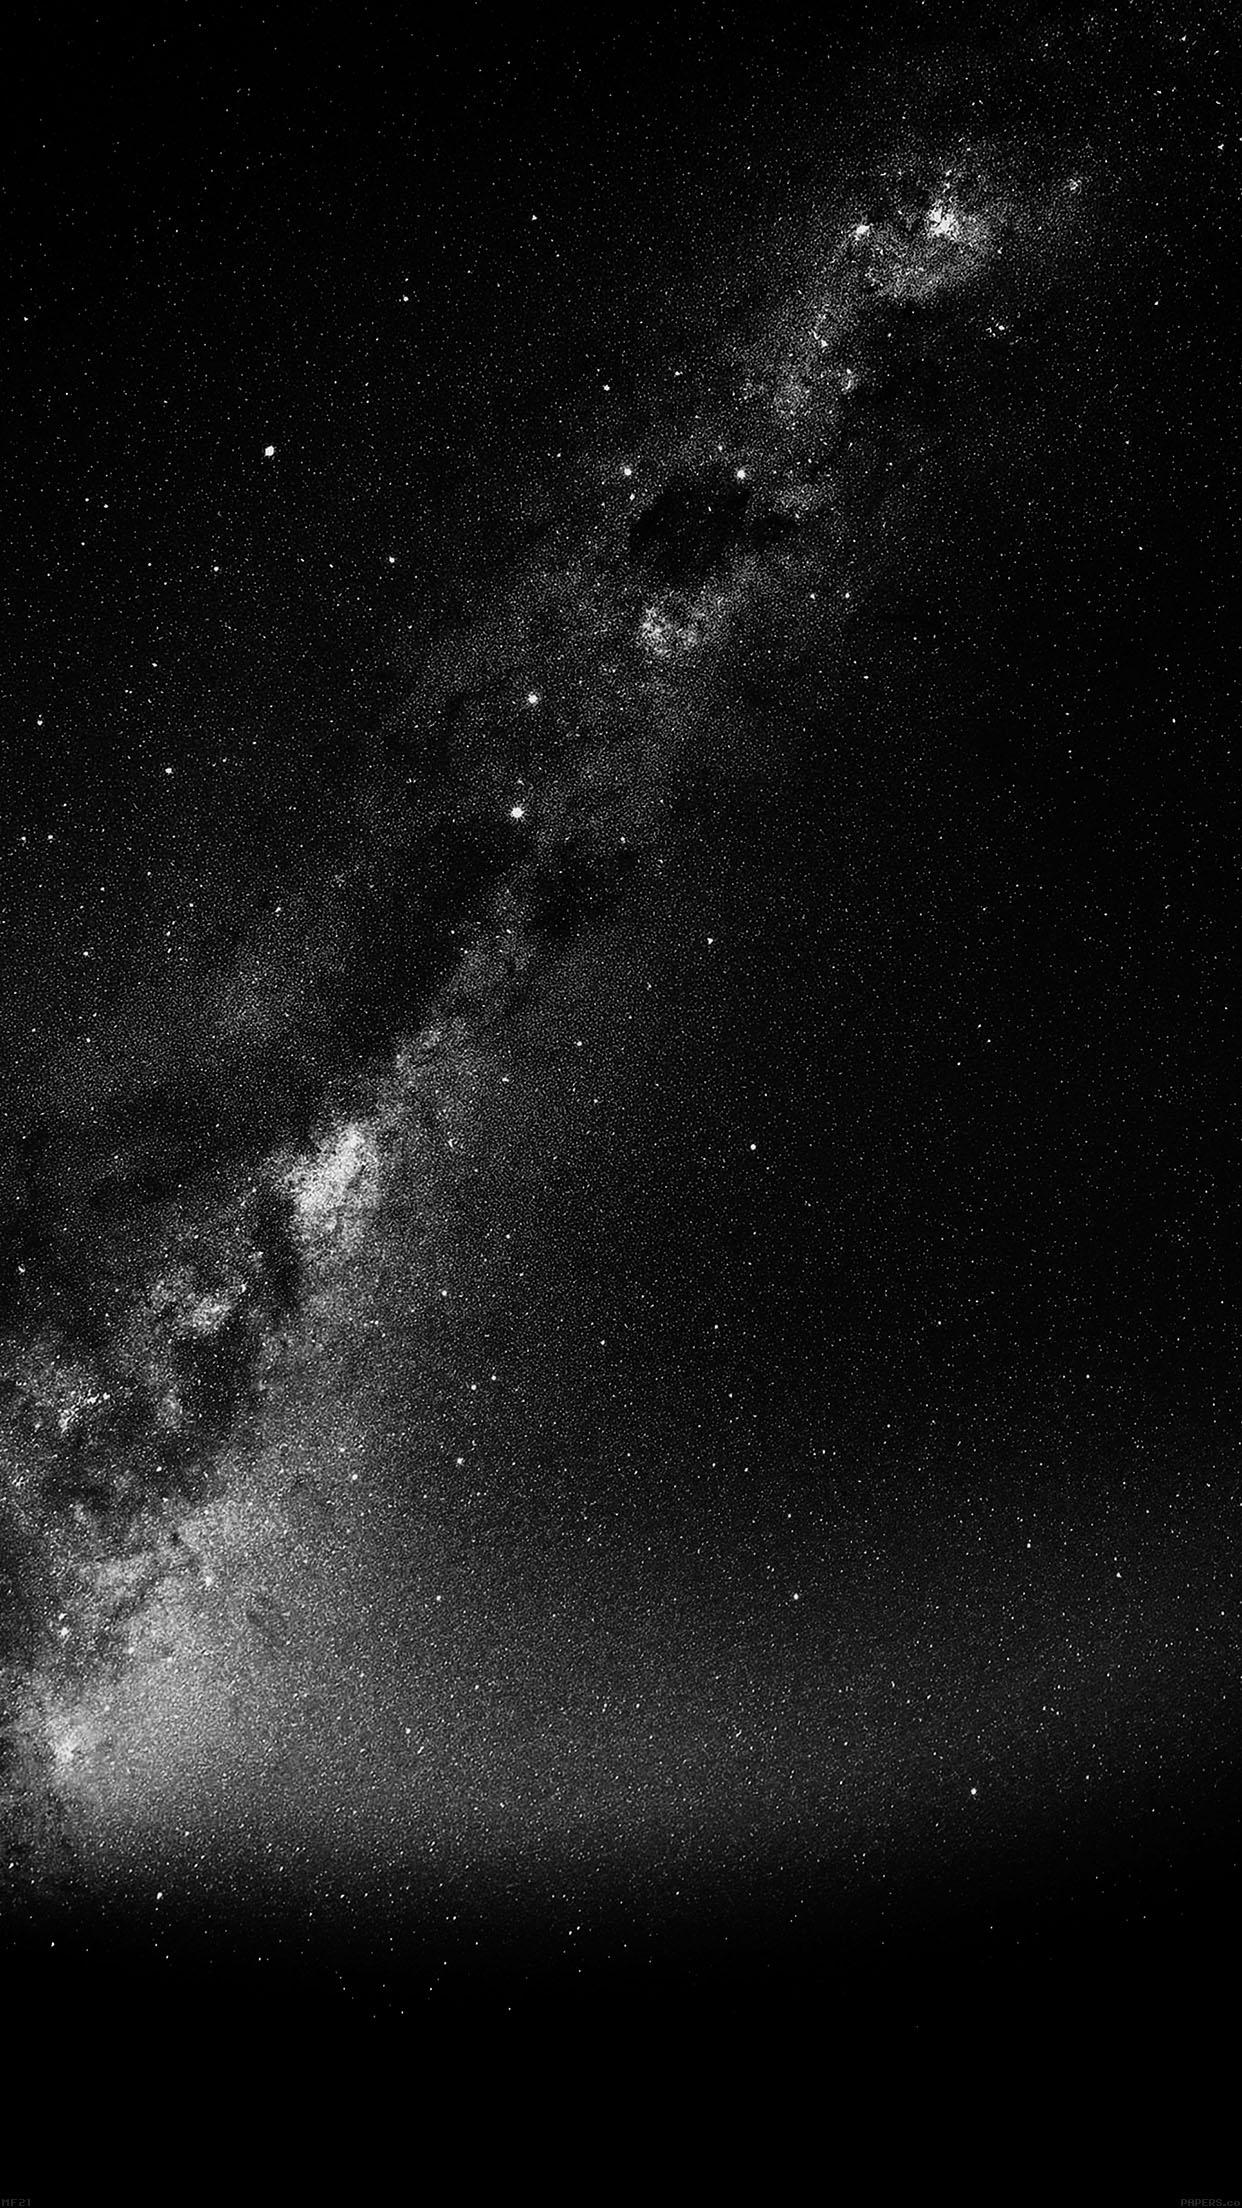 Best Wallpaper Night Dark - Summer-Black-Night-Revisited-Star-Space-Sky  Image.jpg